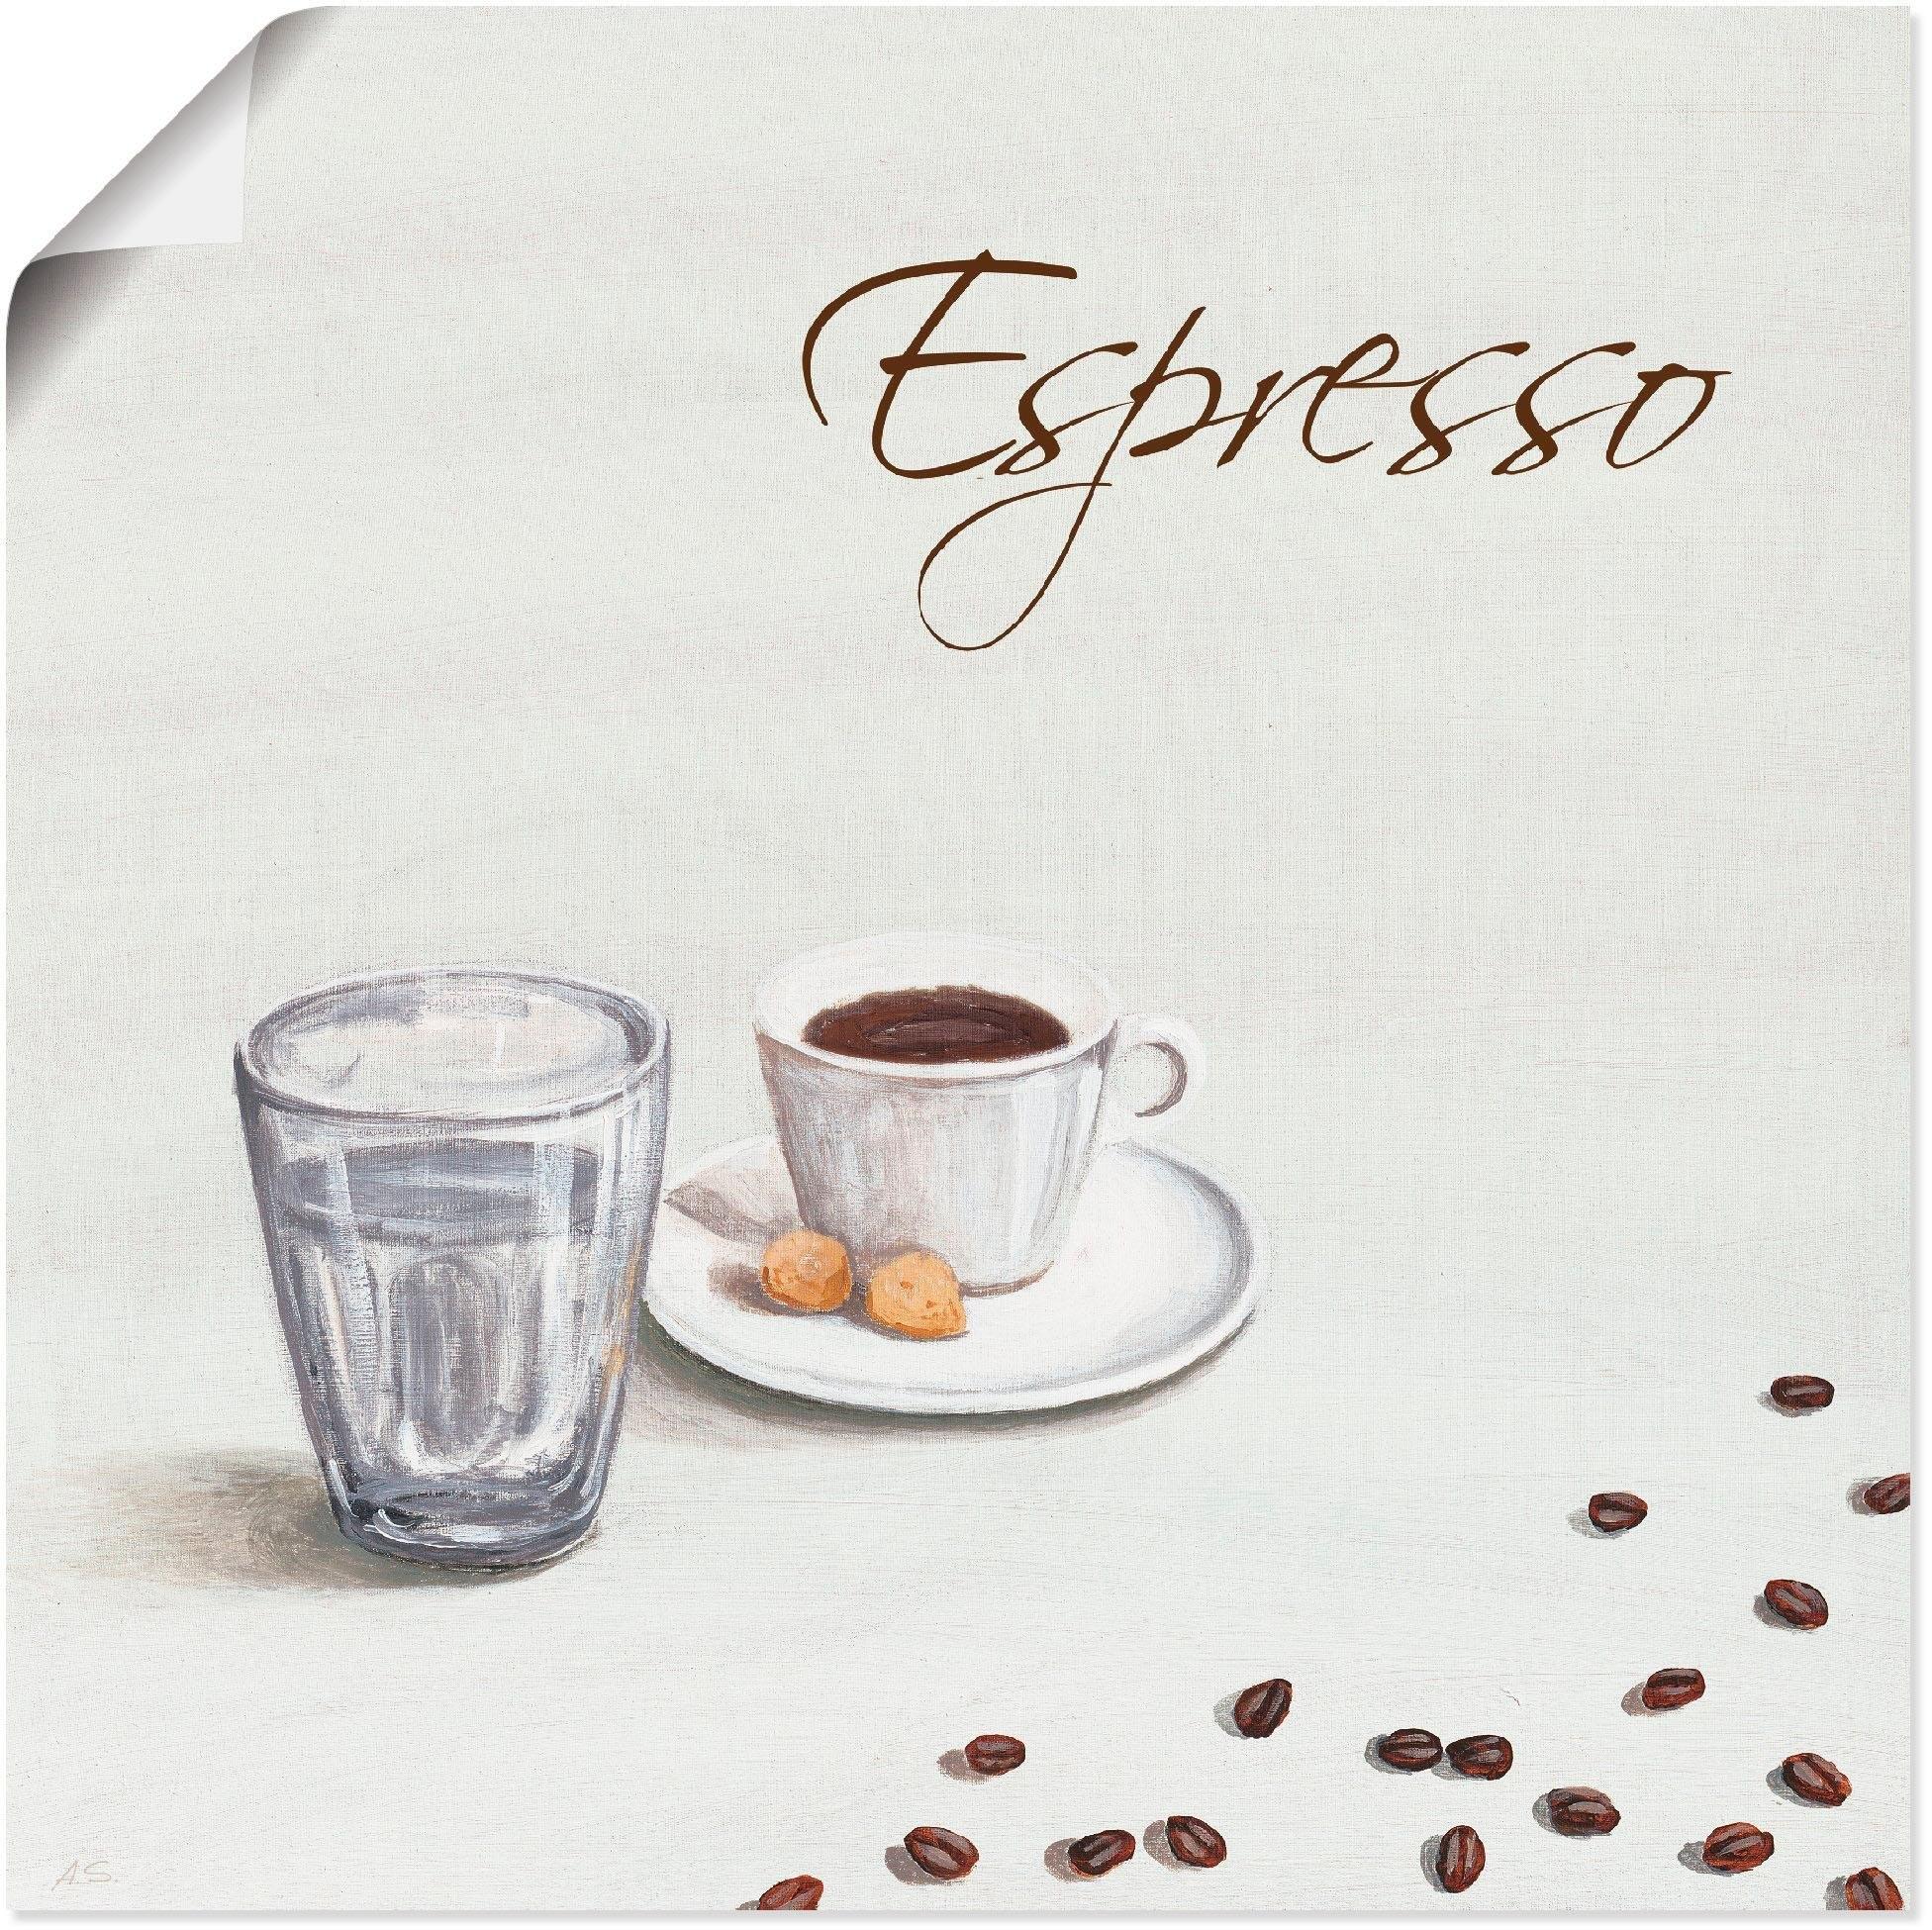 Artland artprint »Espresso III« - verschillende betaalmethodes